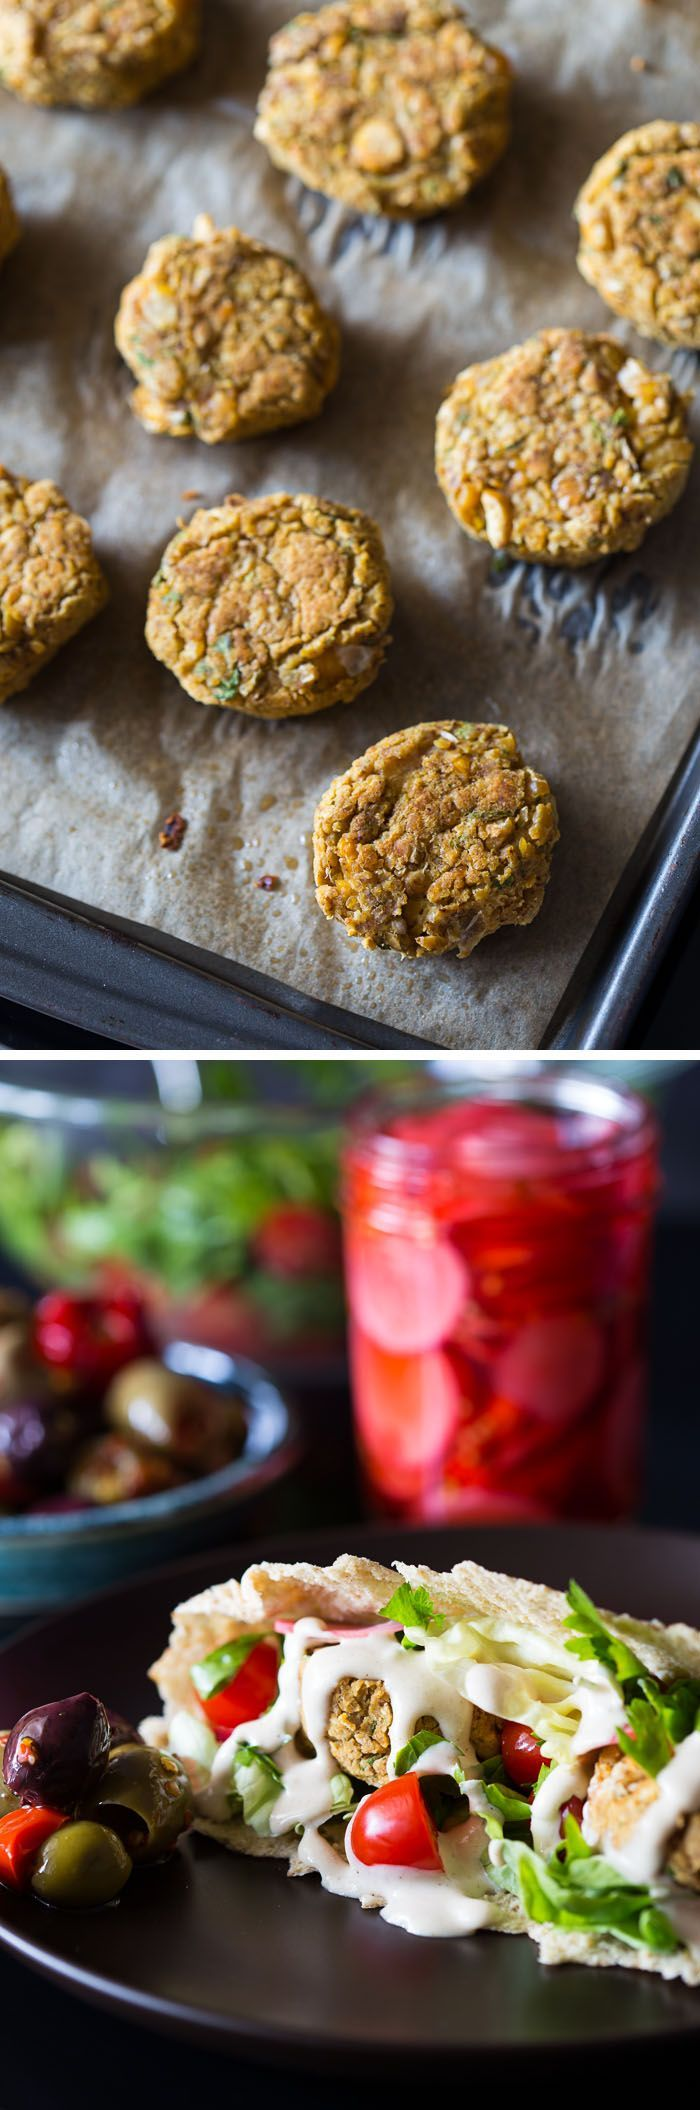 Blue apron falafel - A Healthy Delicious Vegan Weeknight Dinner Recipe For Fully Loaded Baked Falafel Pita